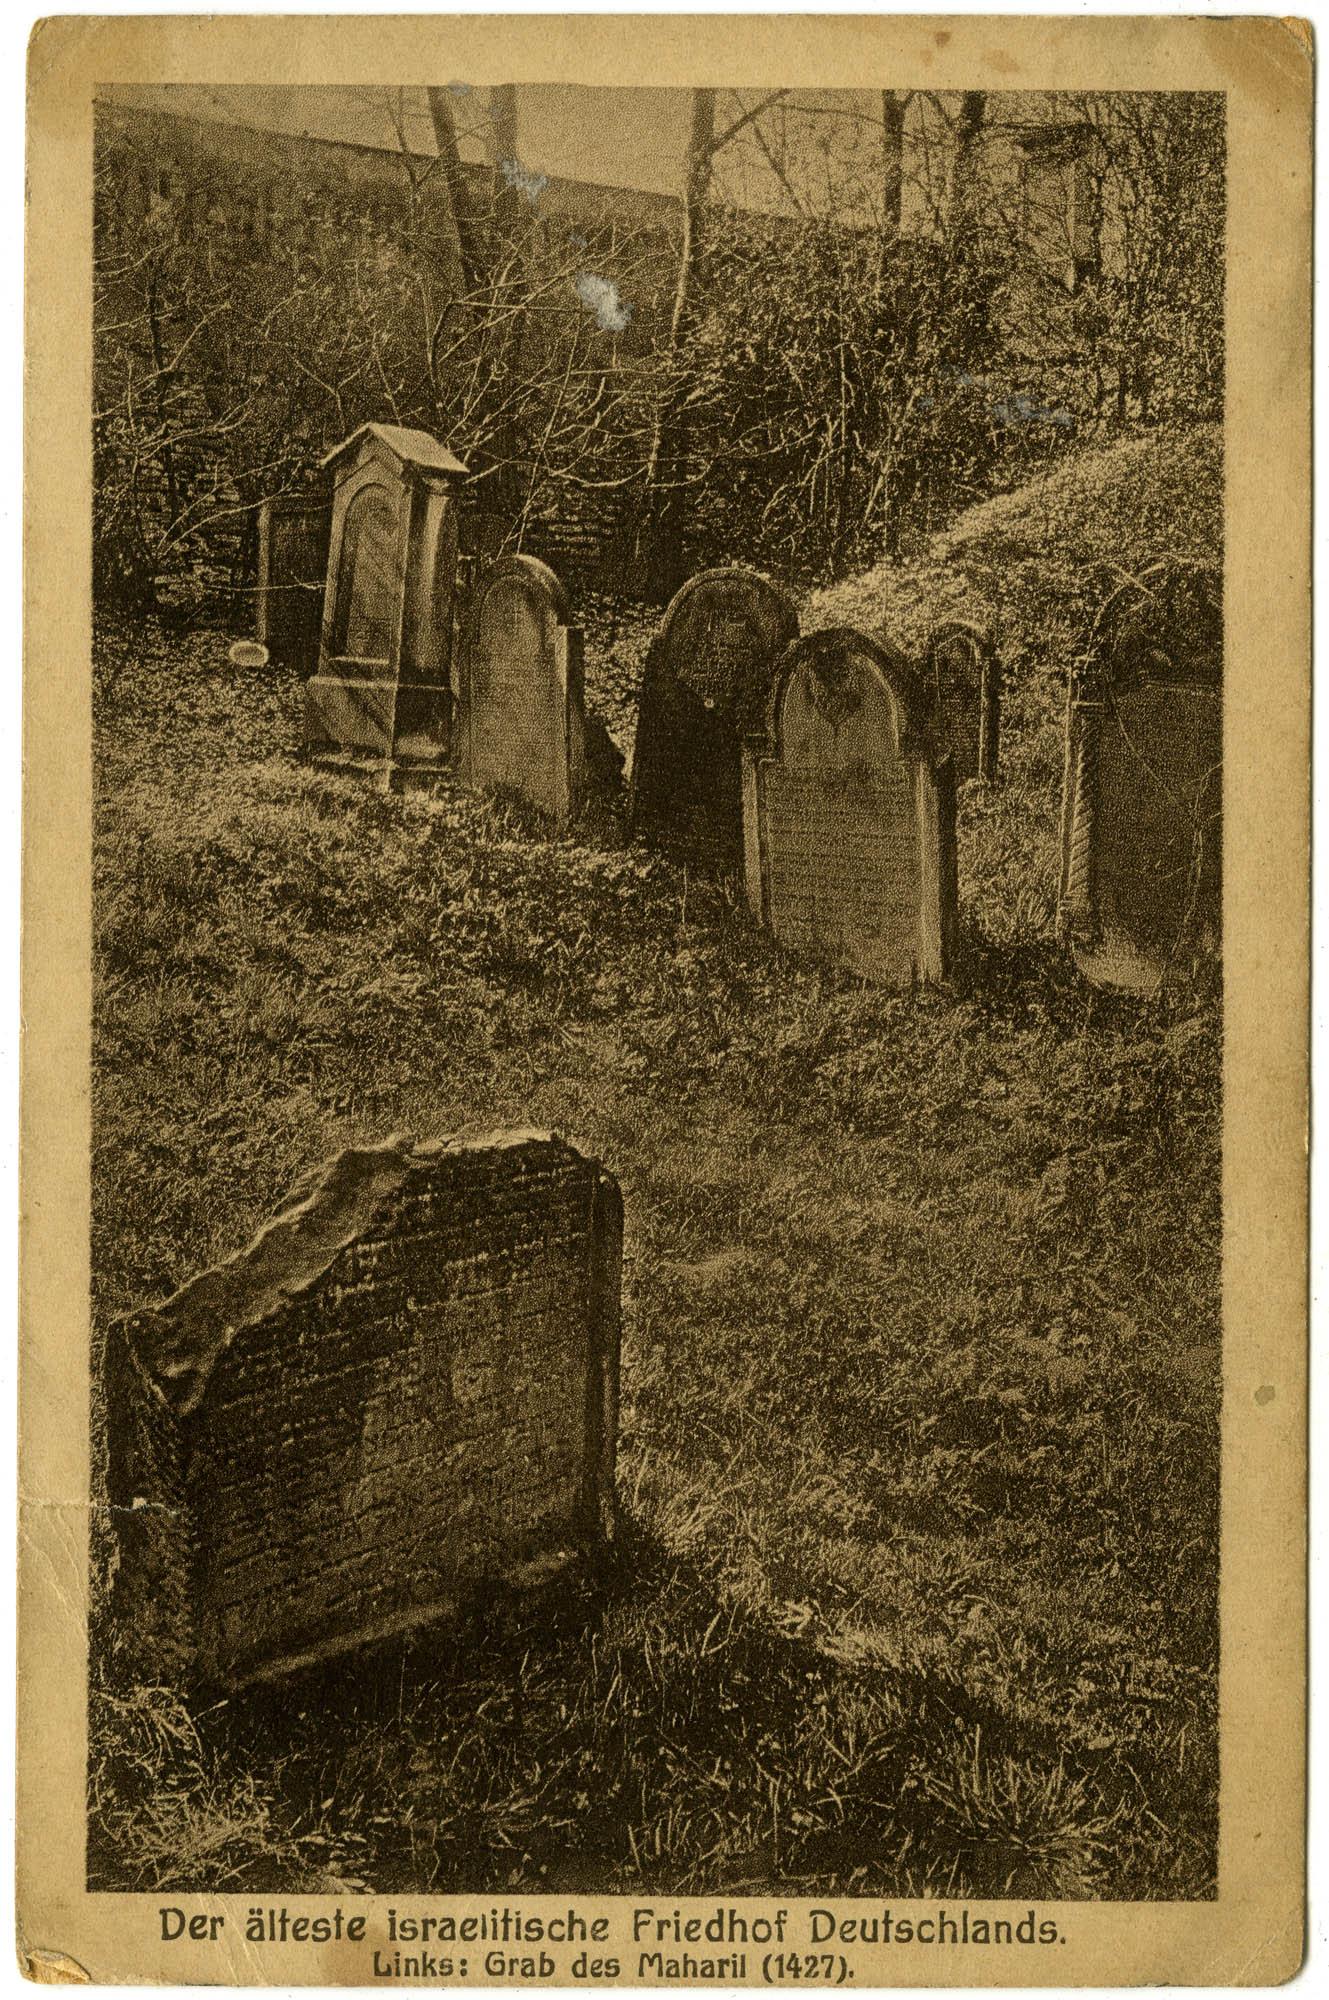 Der älteste israelitische Friedhof Deutschlands. Links: Grab des Maharil (1427).